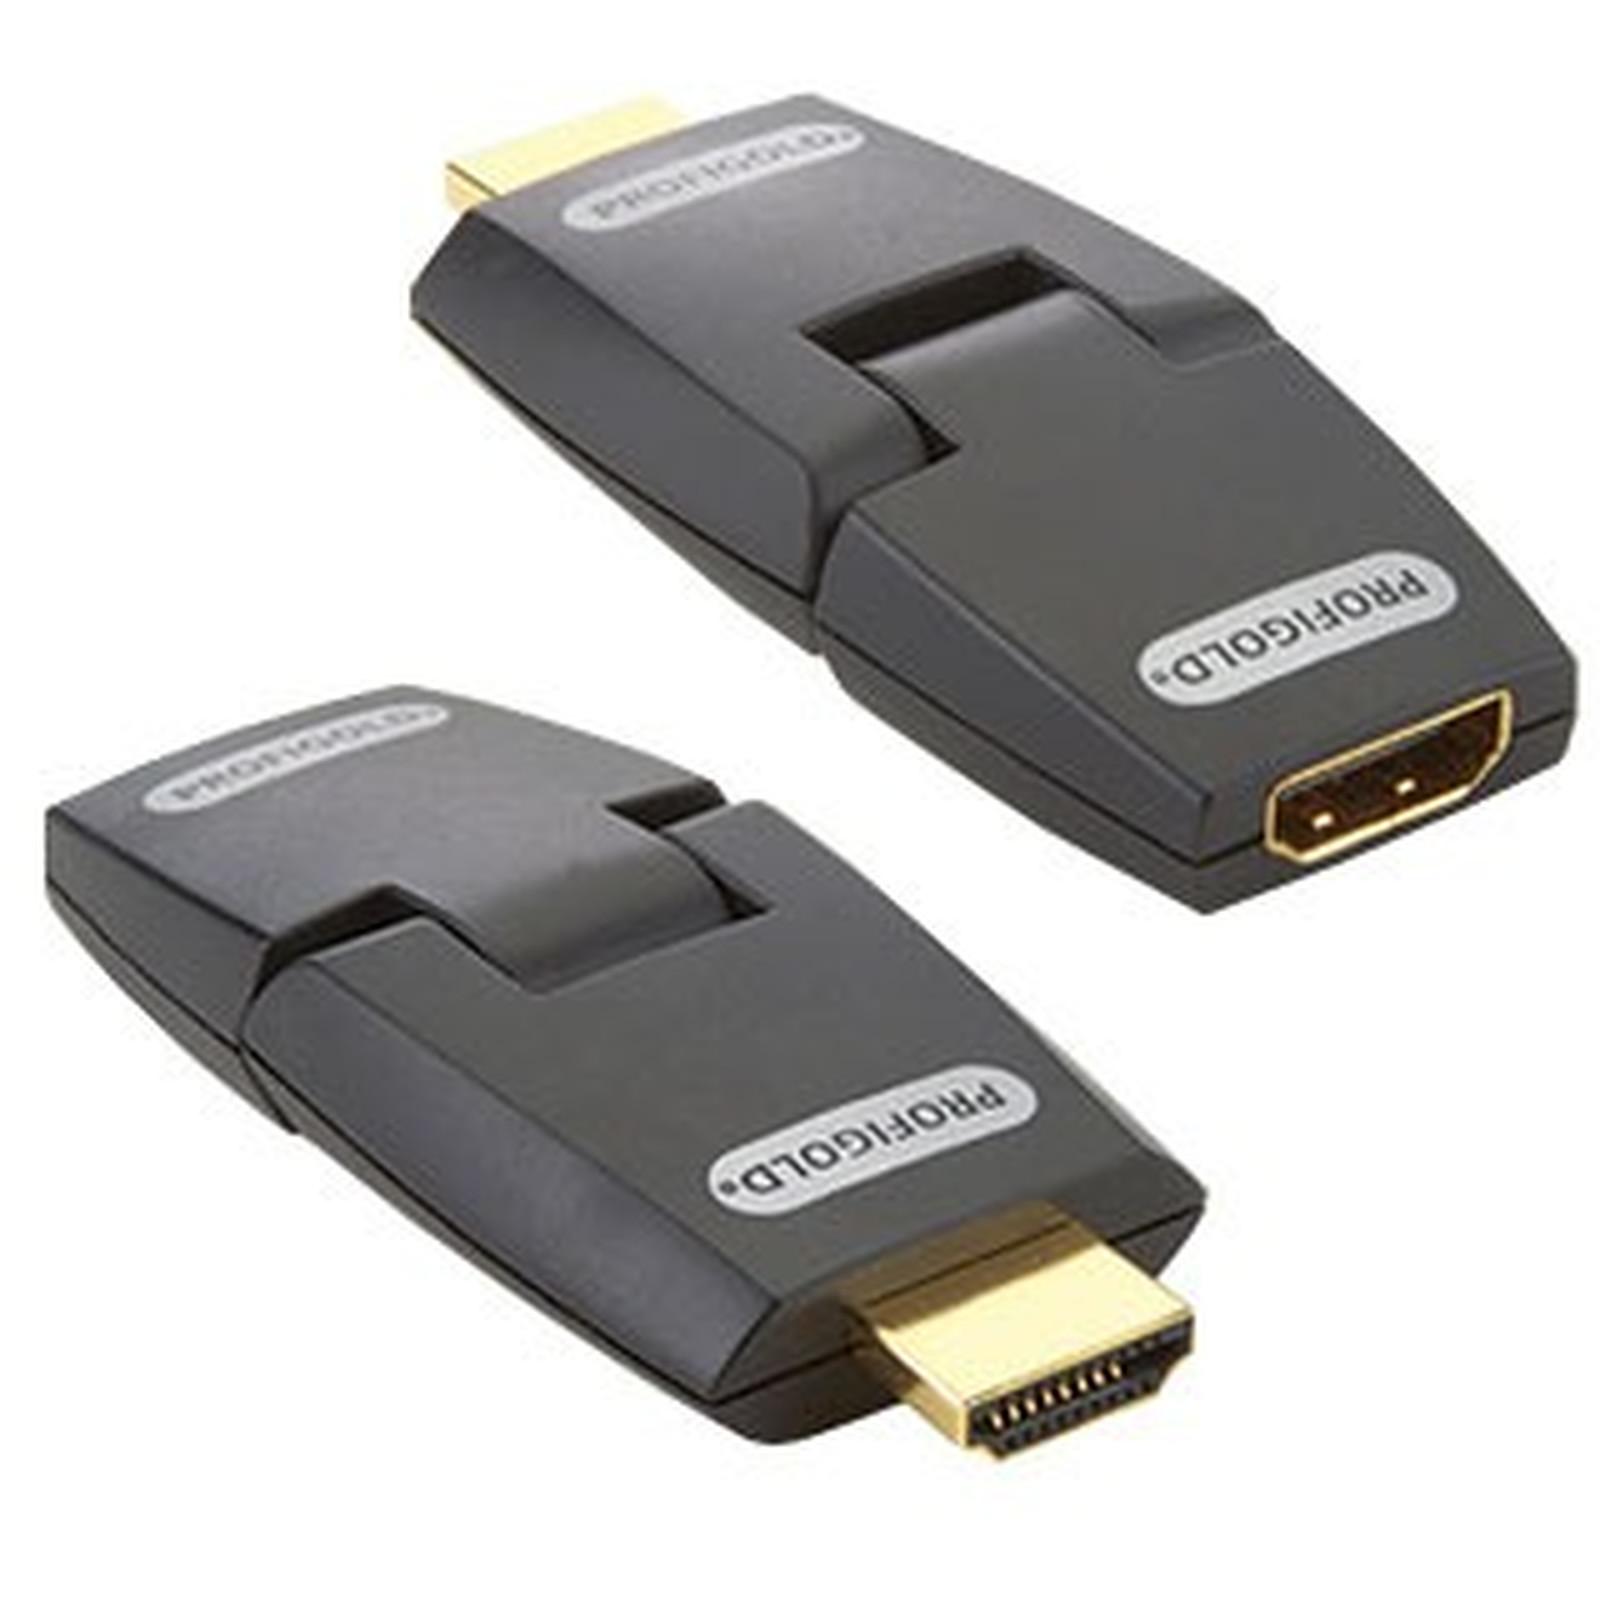 Profigold Adaptateur pivotant HDMI 1.3 Femelle/Mâle